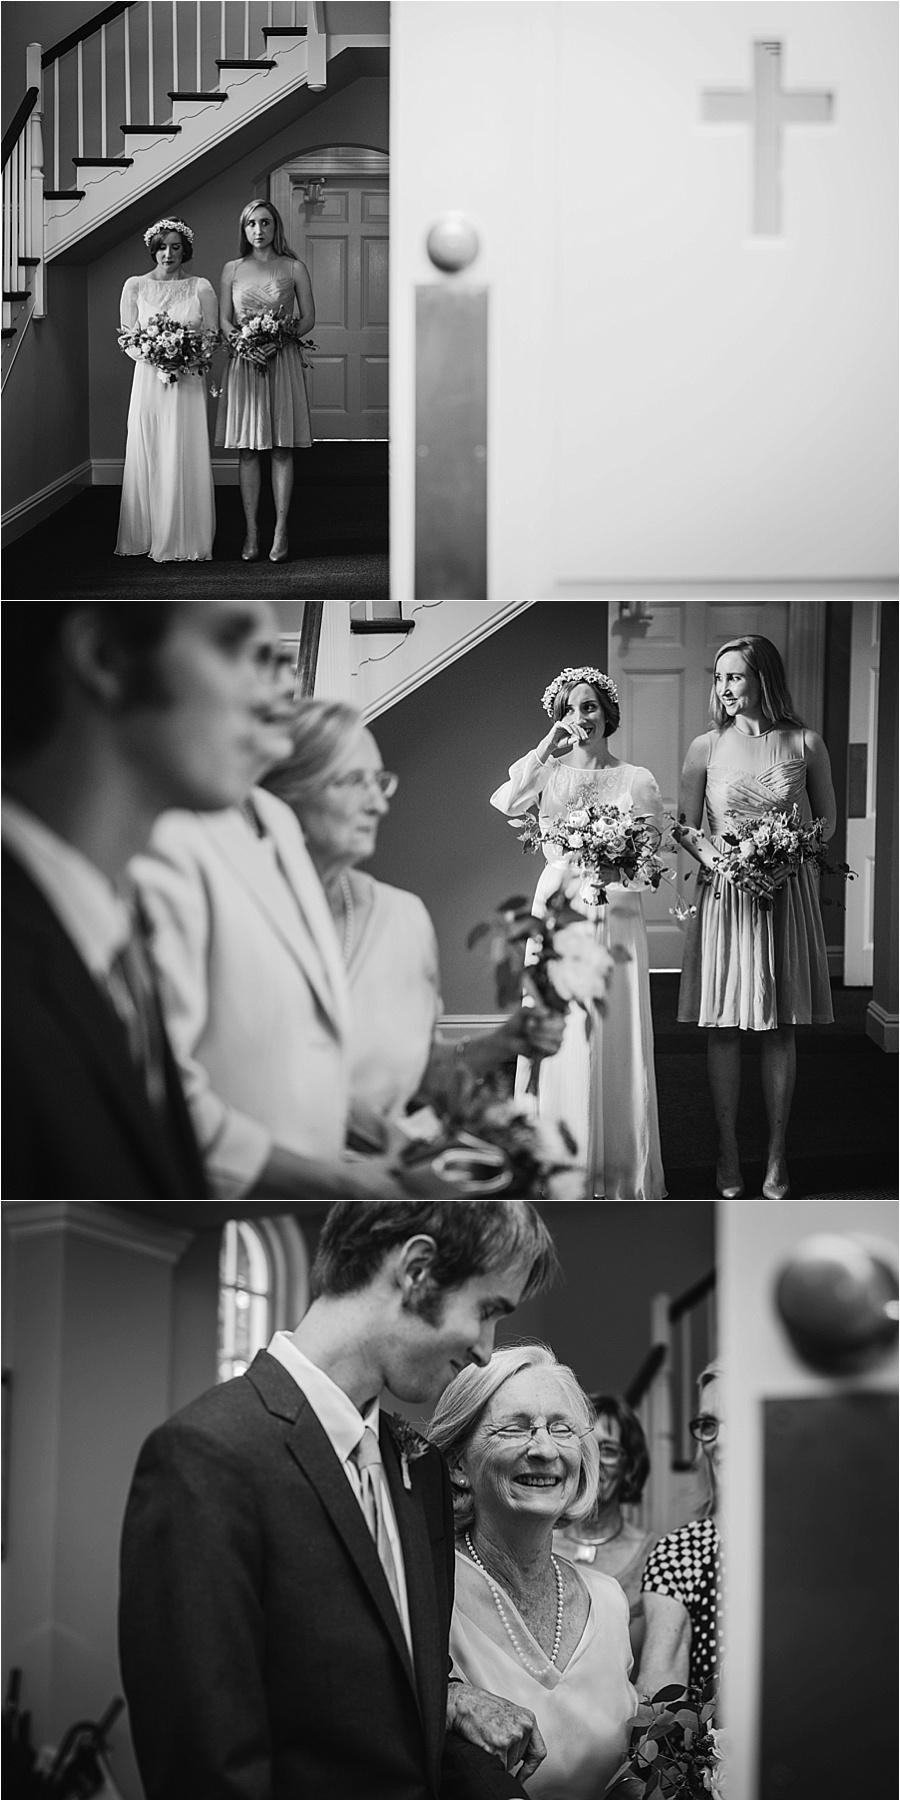 CK-Photo-Nashville-Wedding-Photographer-b_0073.jpg